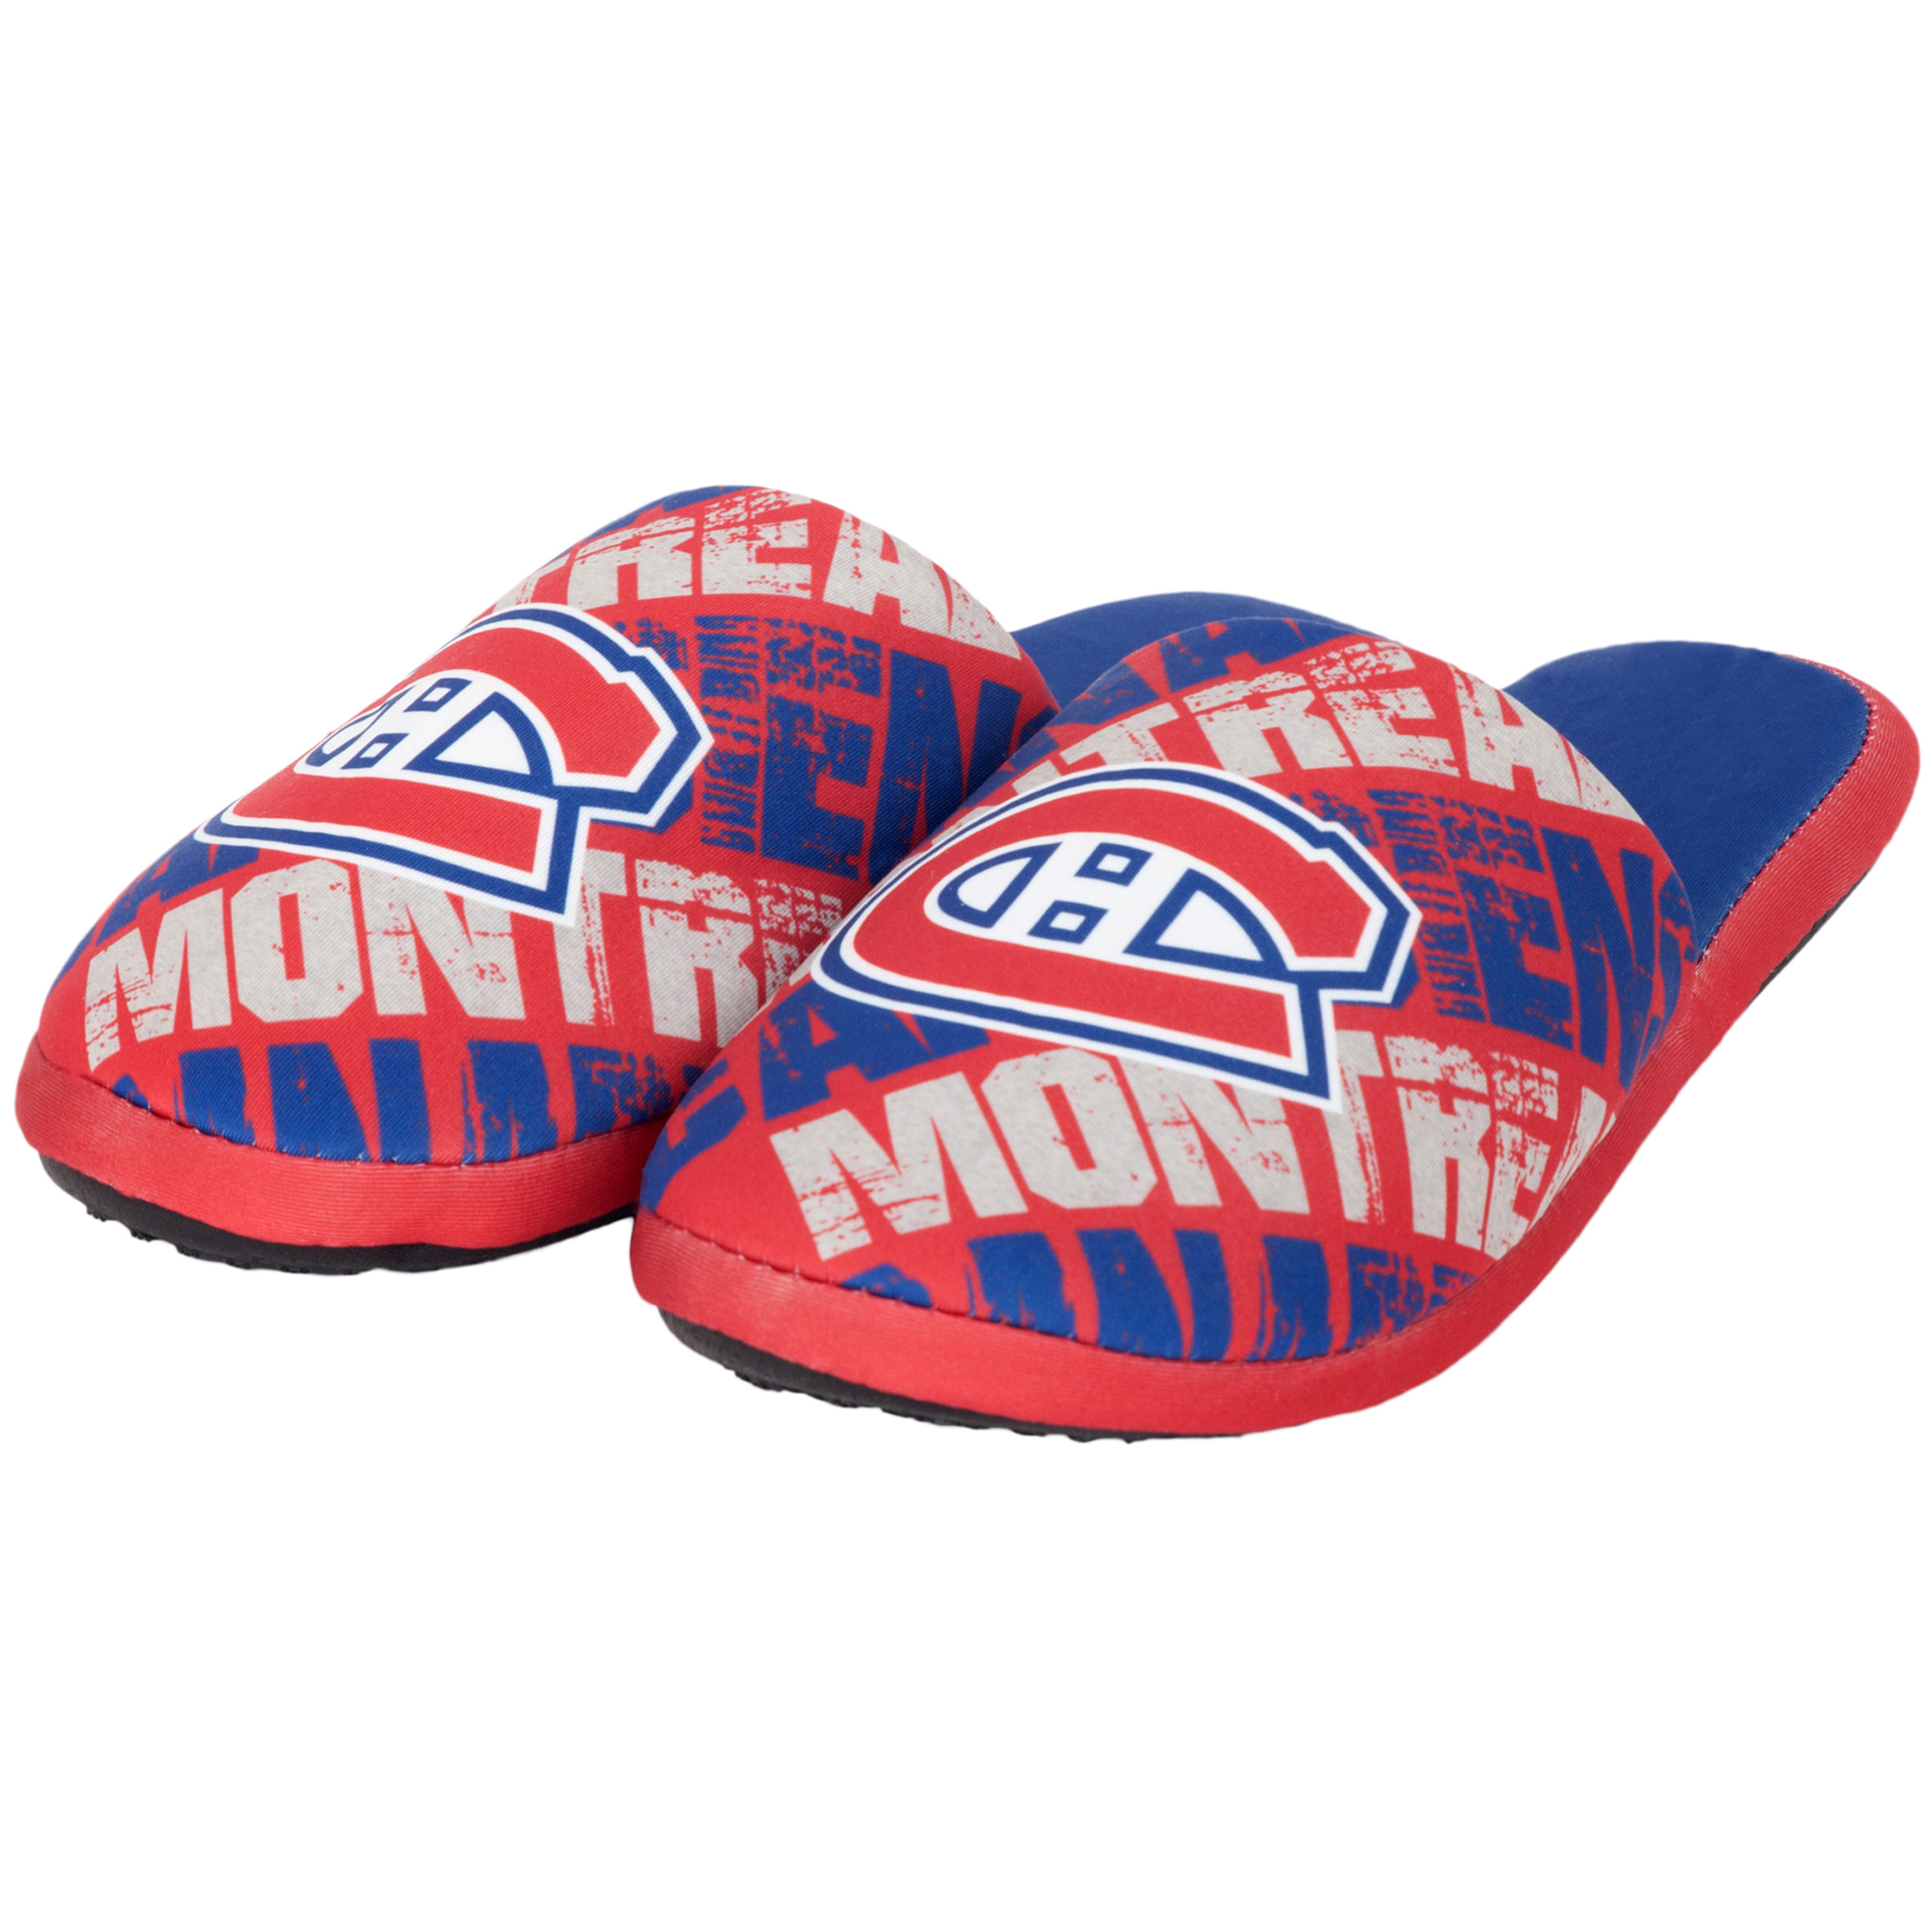 Montreal Canadiens Digital Print Slippers - Red